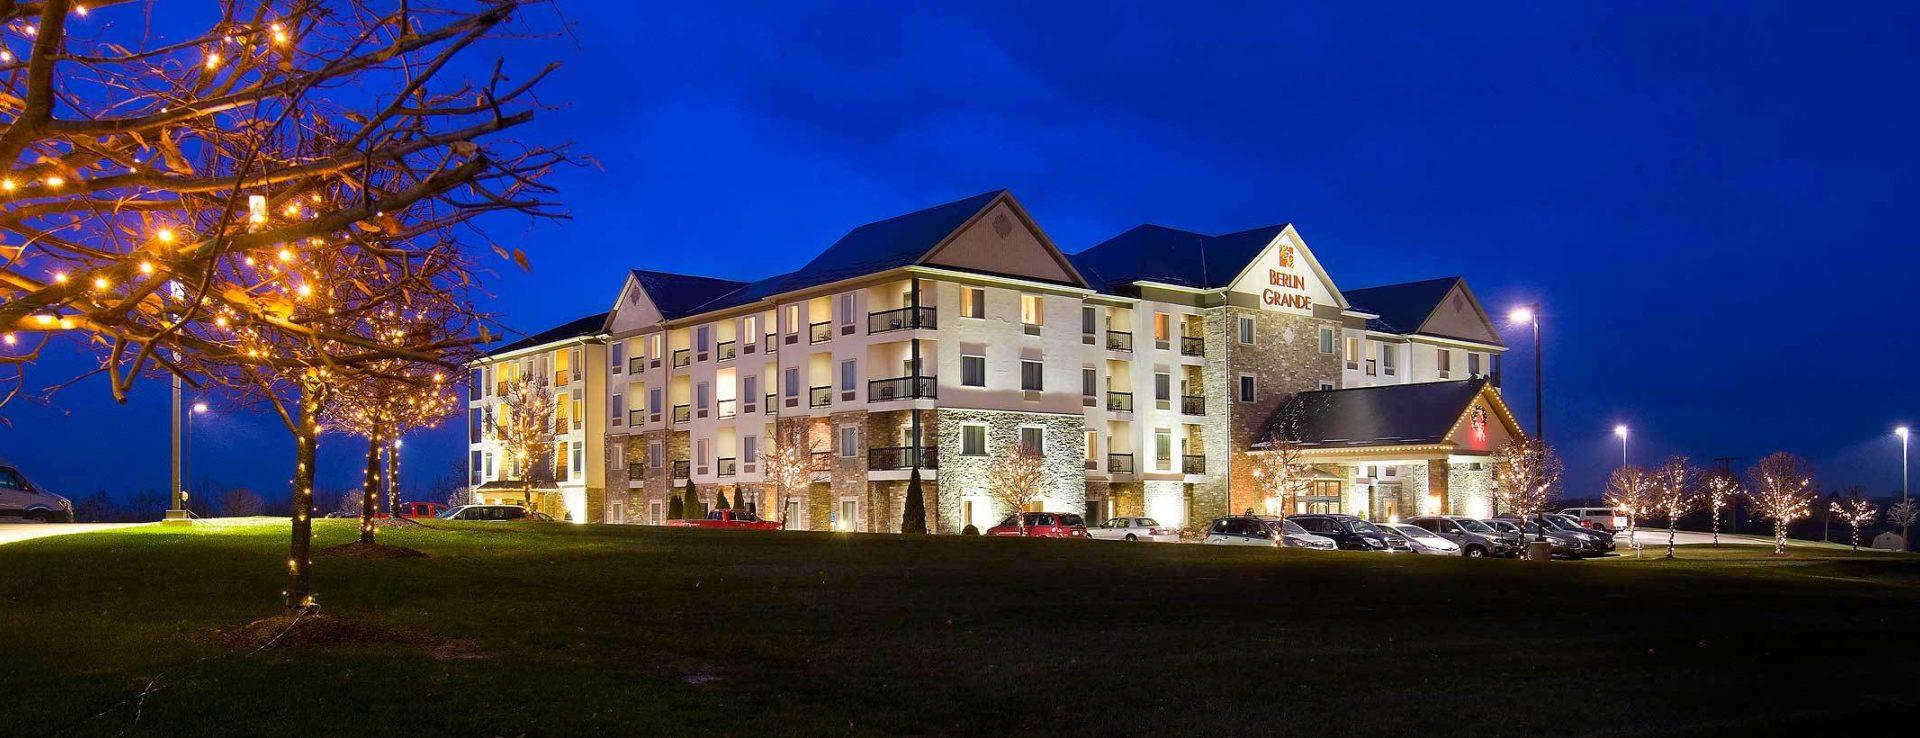 Berlin Grande Hotel Ohio S Amish Country